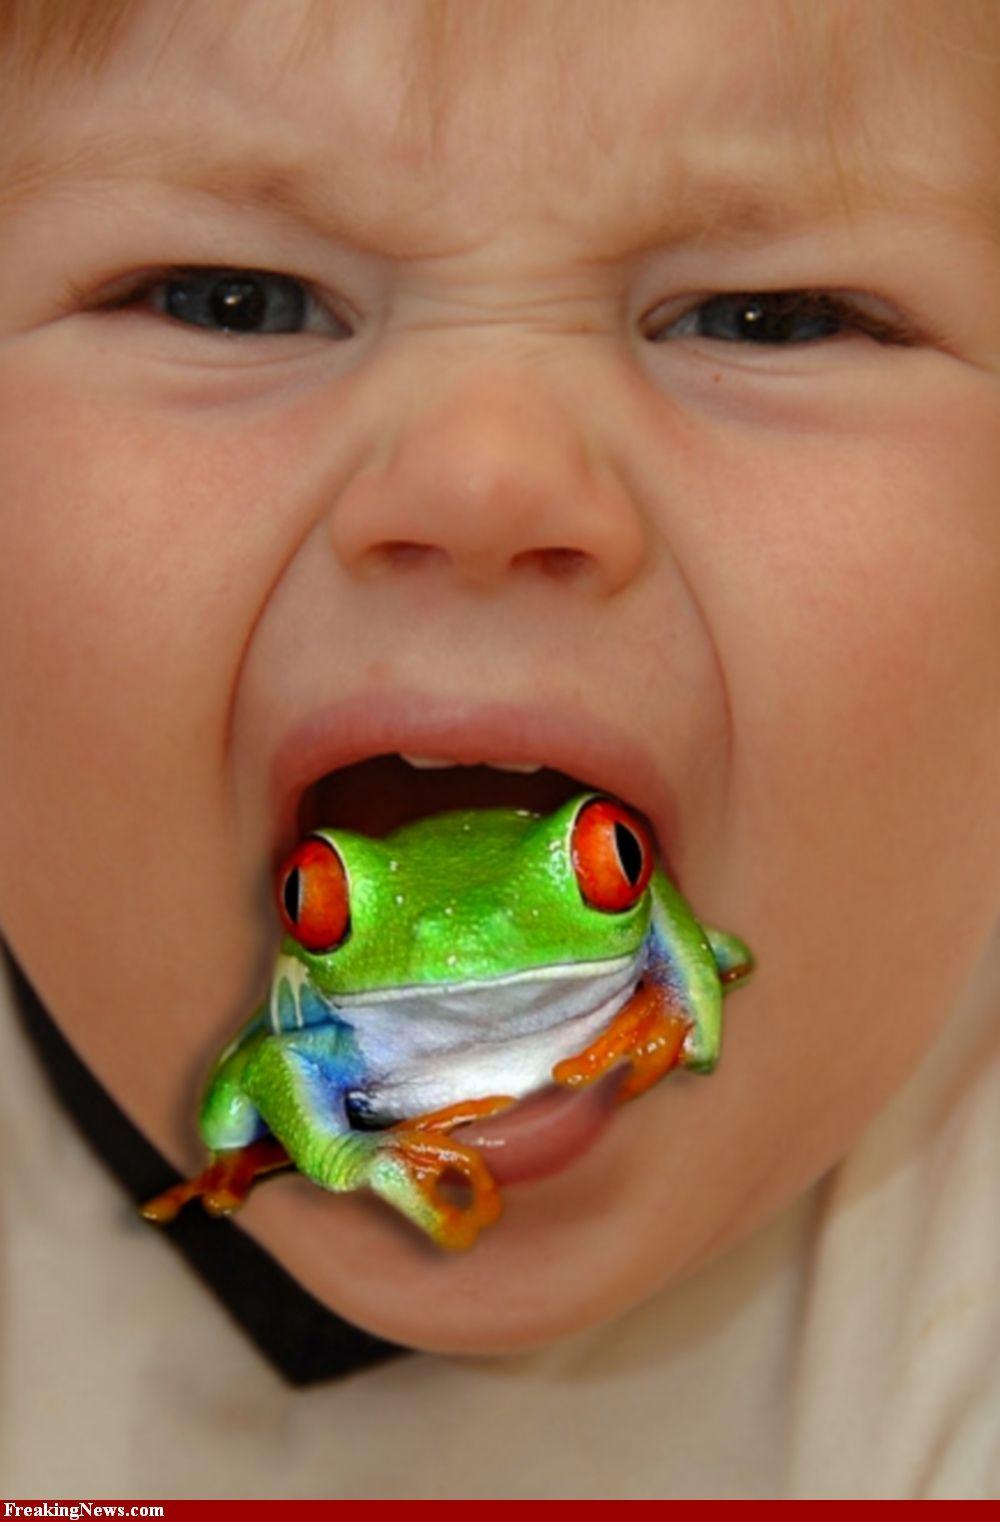 frog throat baby frog tree frogs